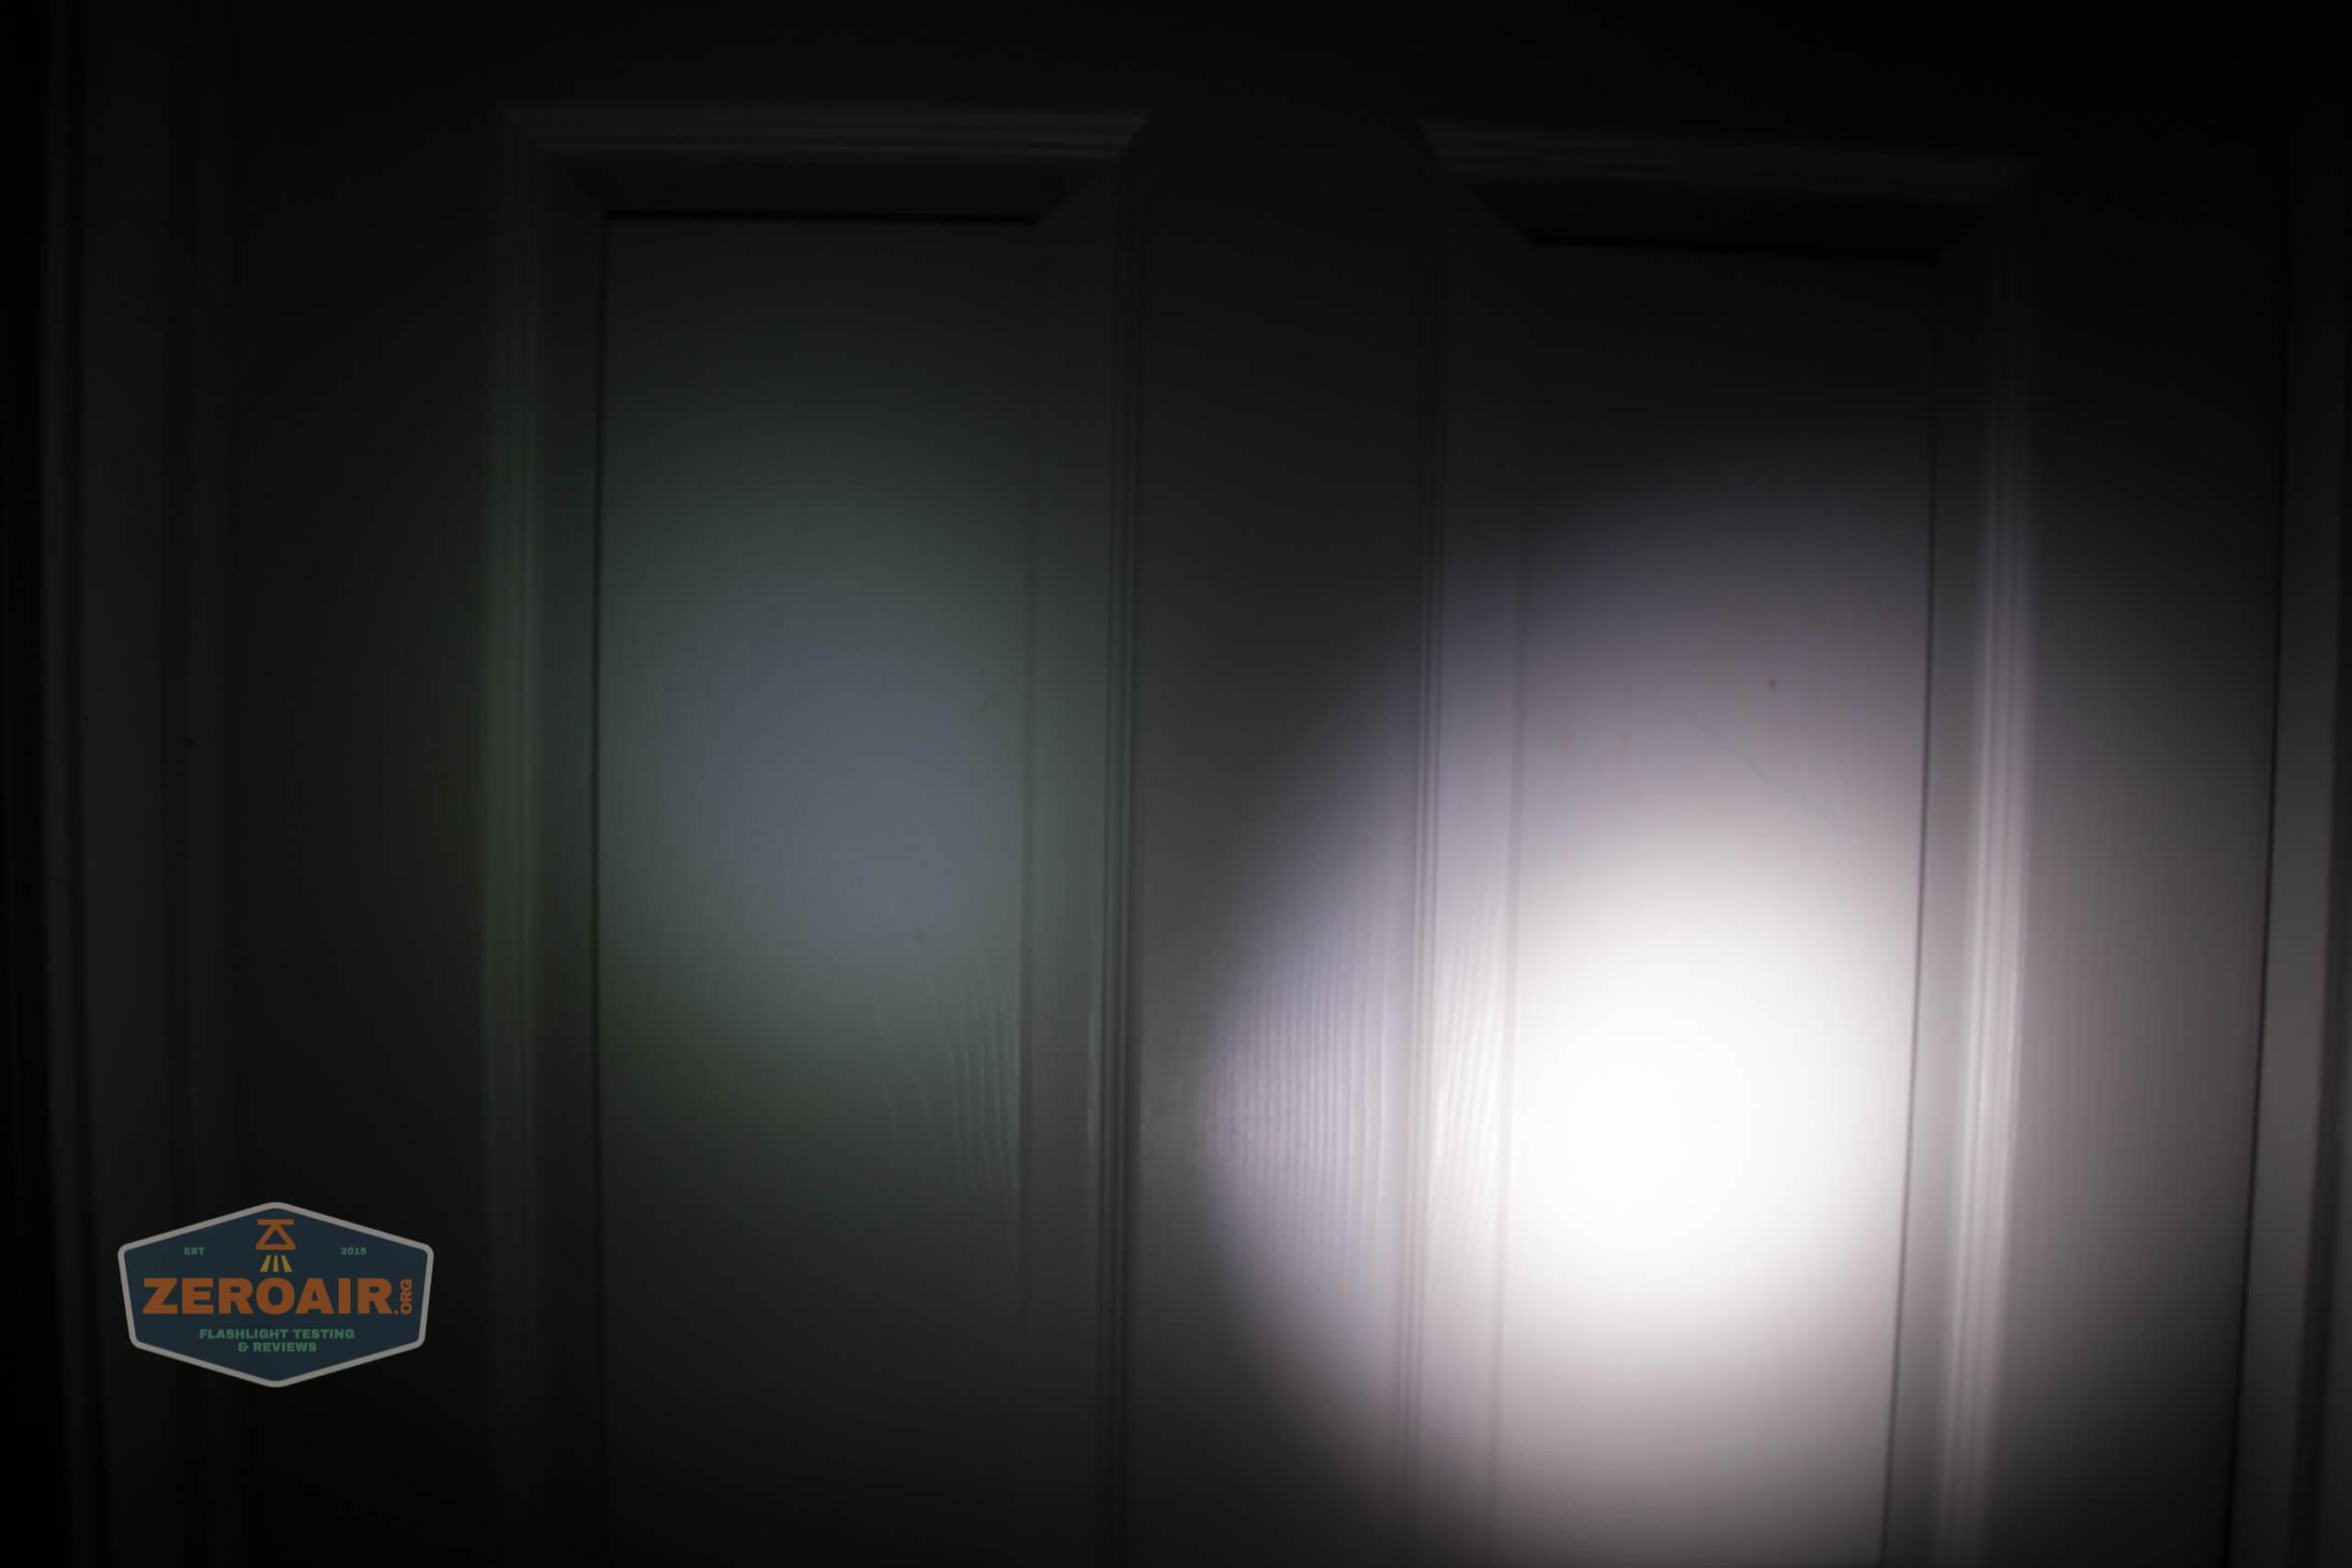 freasygears cyansky m3 titanium pocket flashlight beamshot door 1